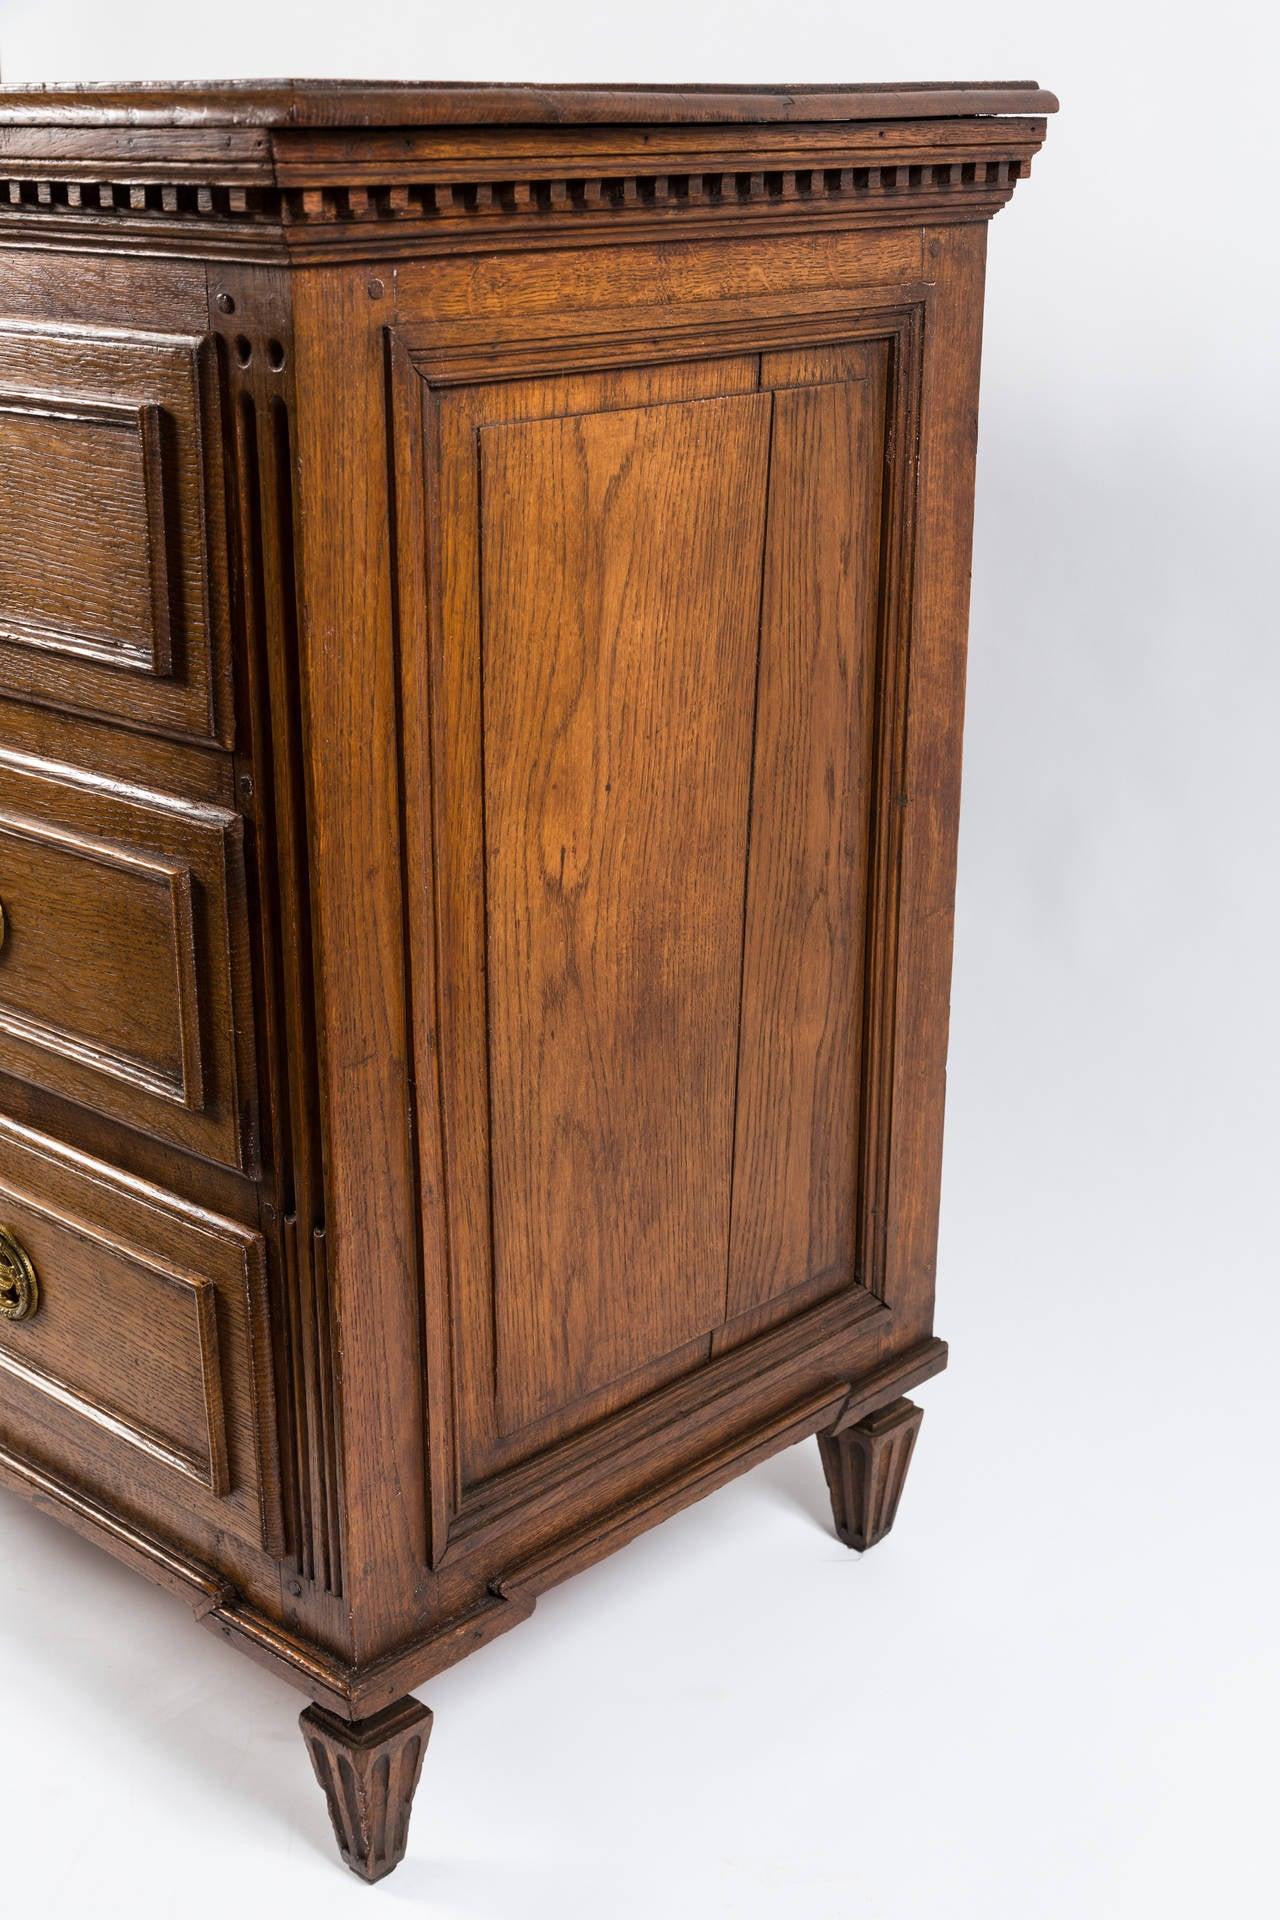 18th Century French Louis XVI Dresser in Solid Oak 4